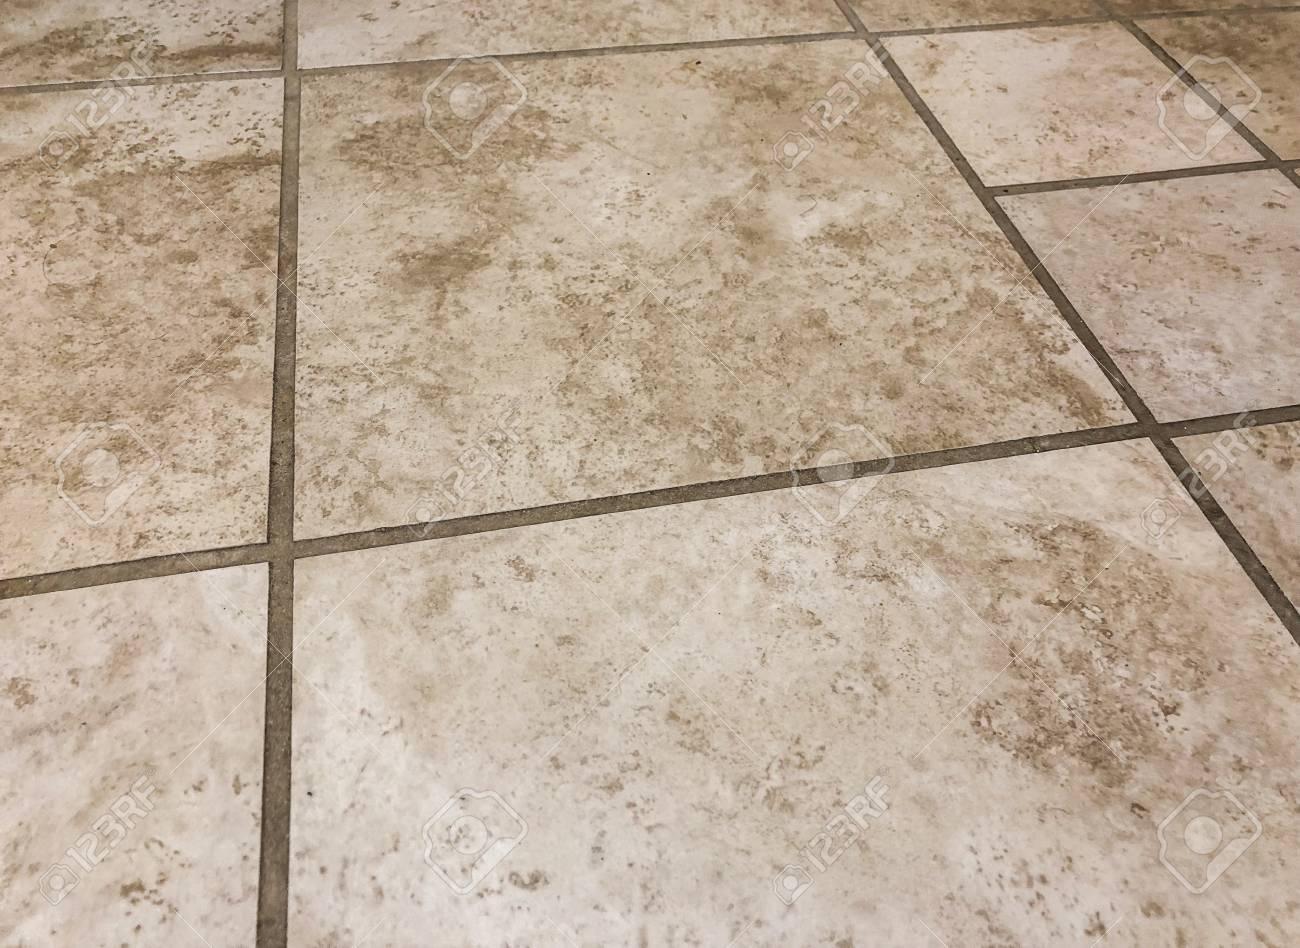 granite brown and beige square tiles plased horisontal in straght